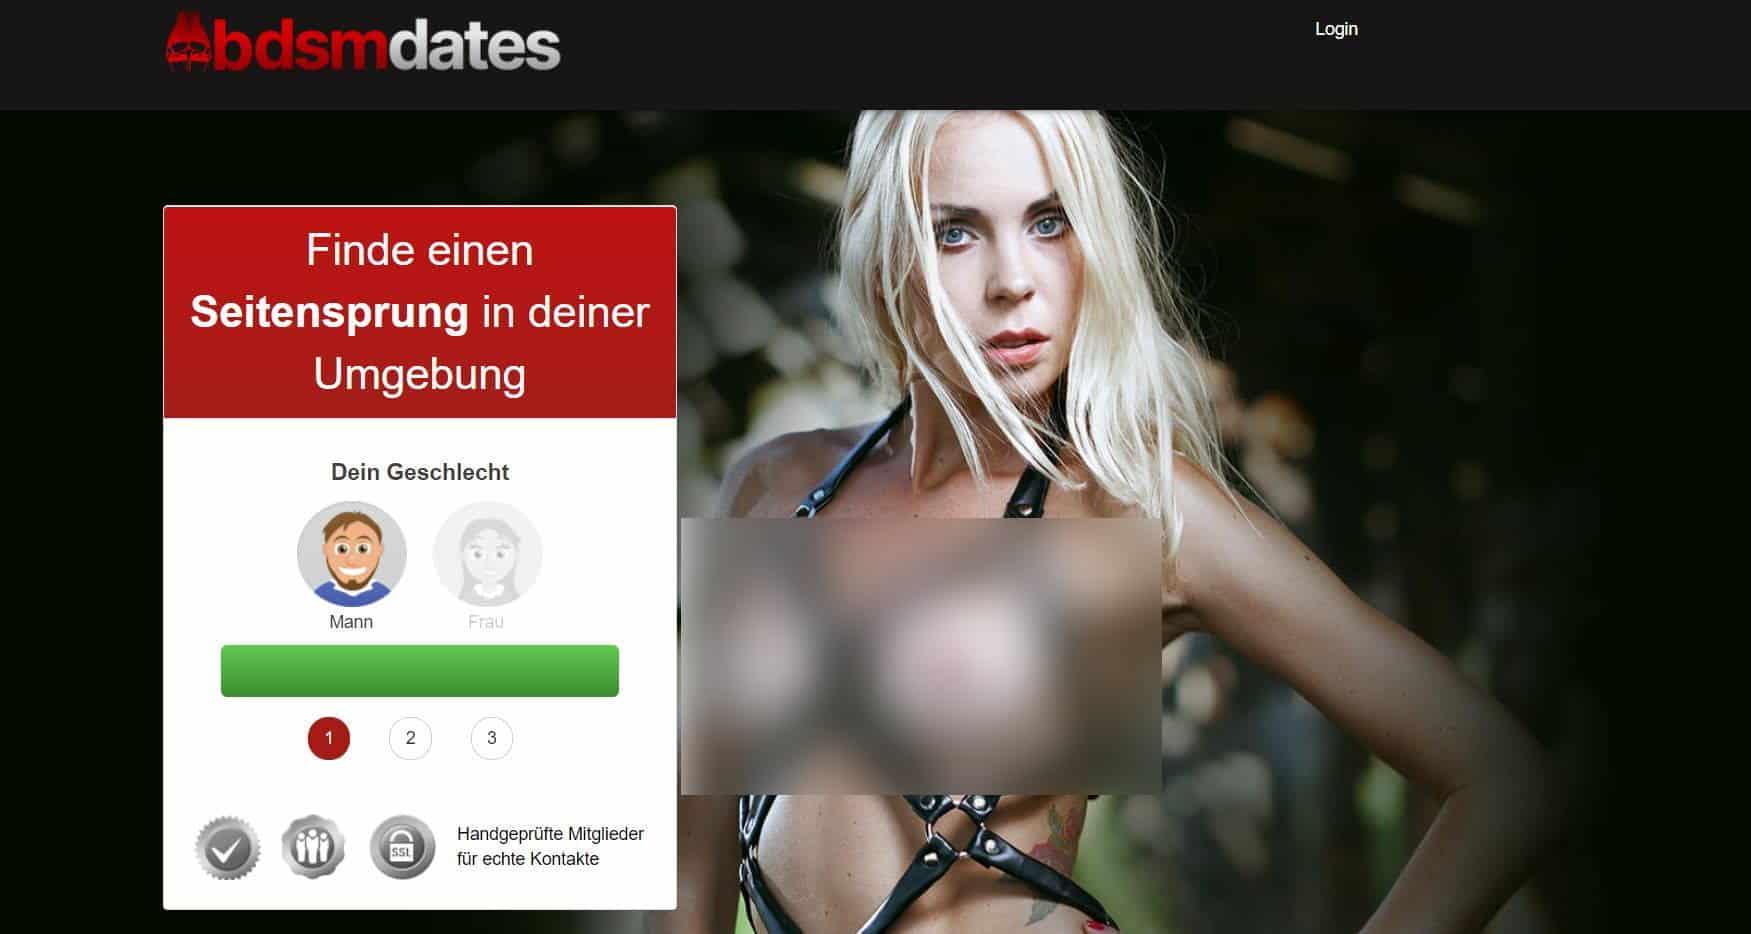 Testbericht: BDSMDates.club Abzocke